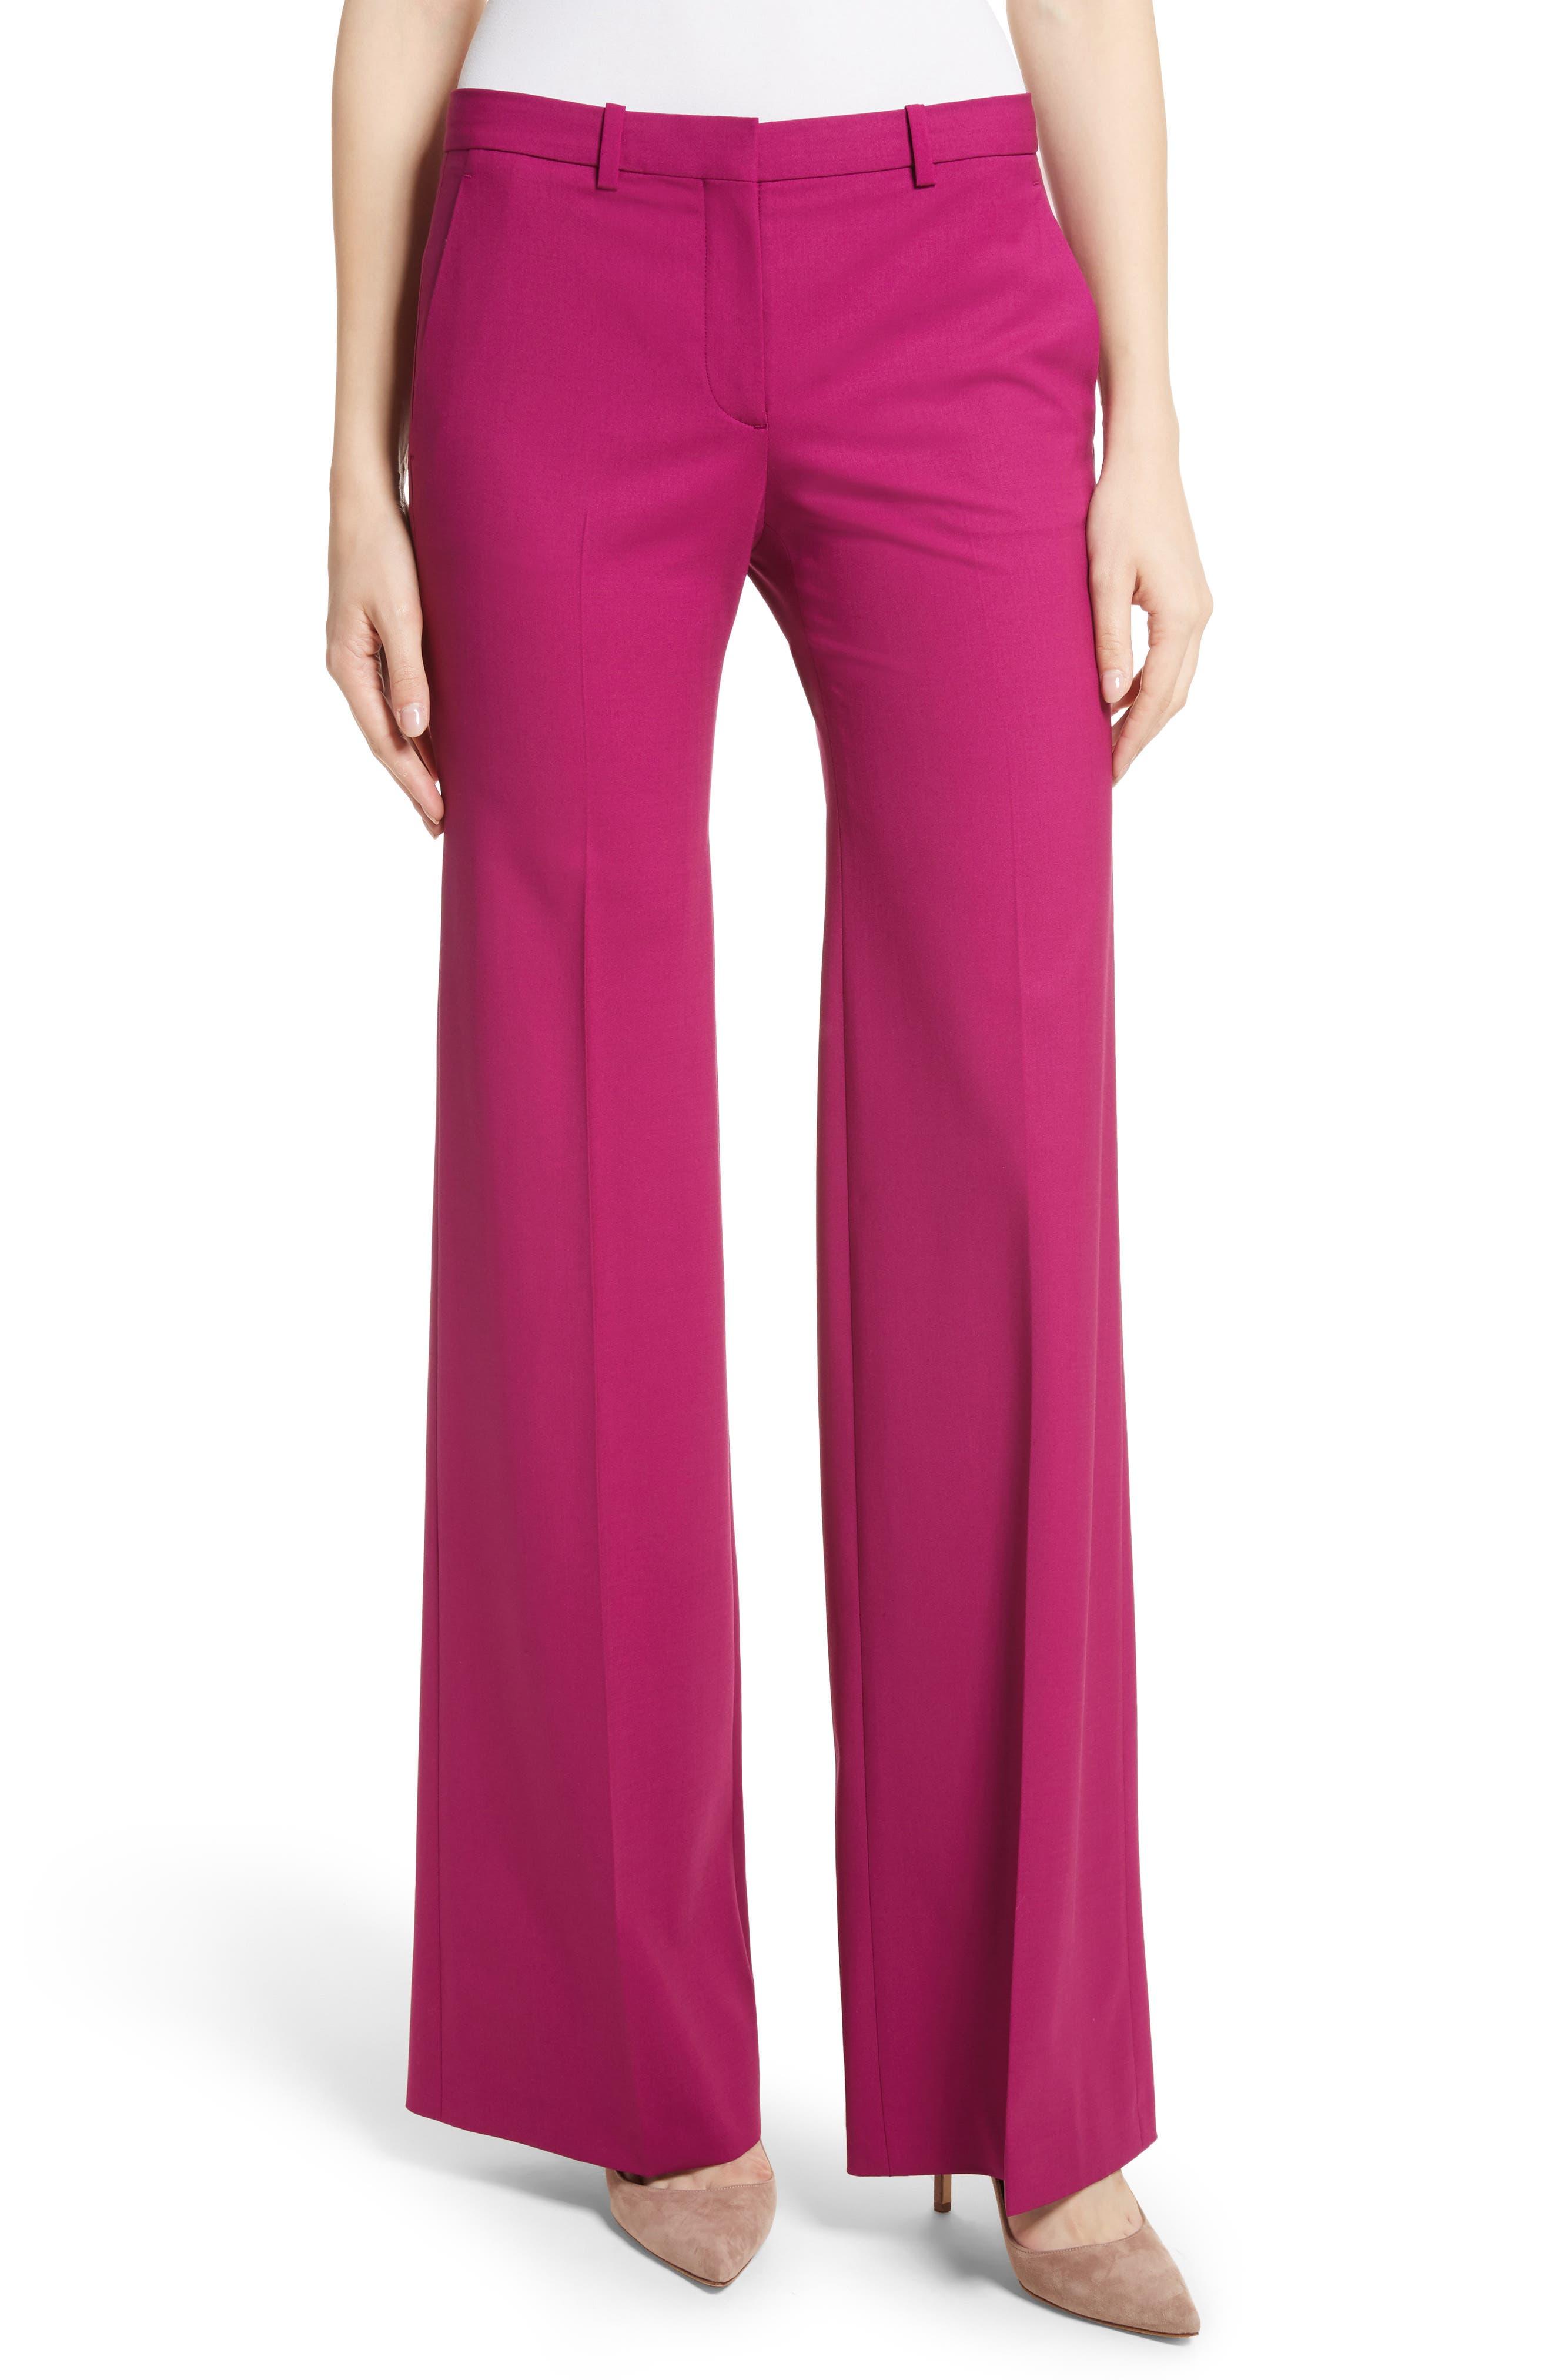 Pink n blue dress pants